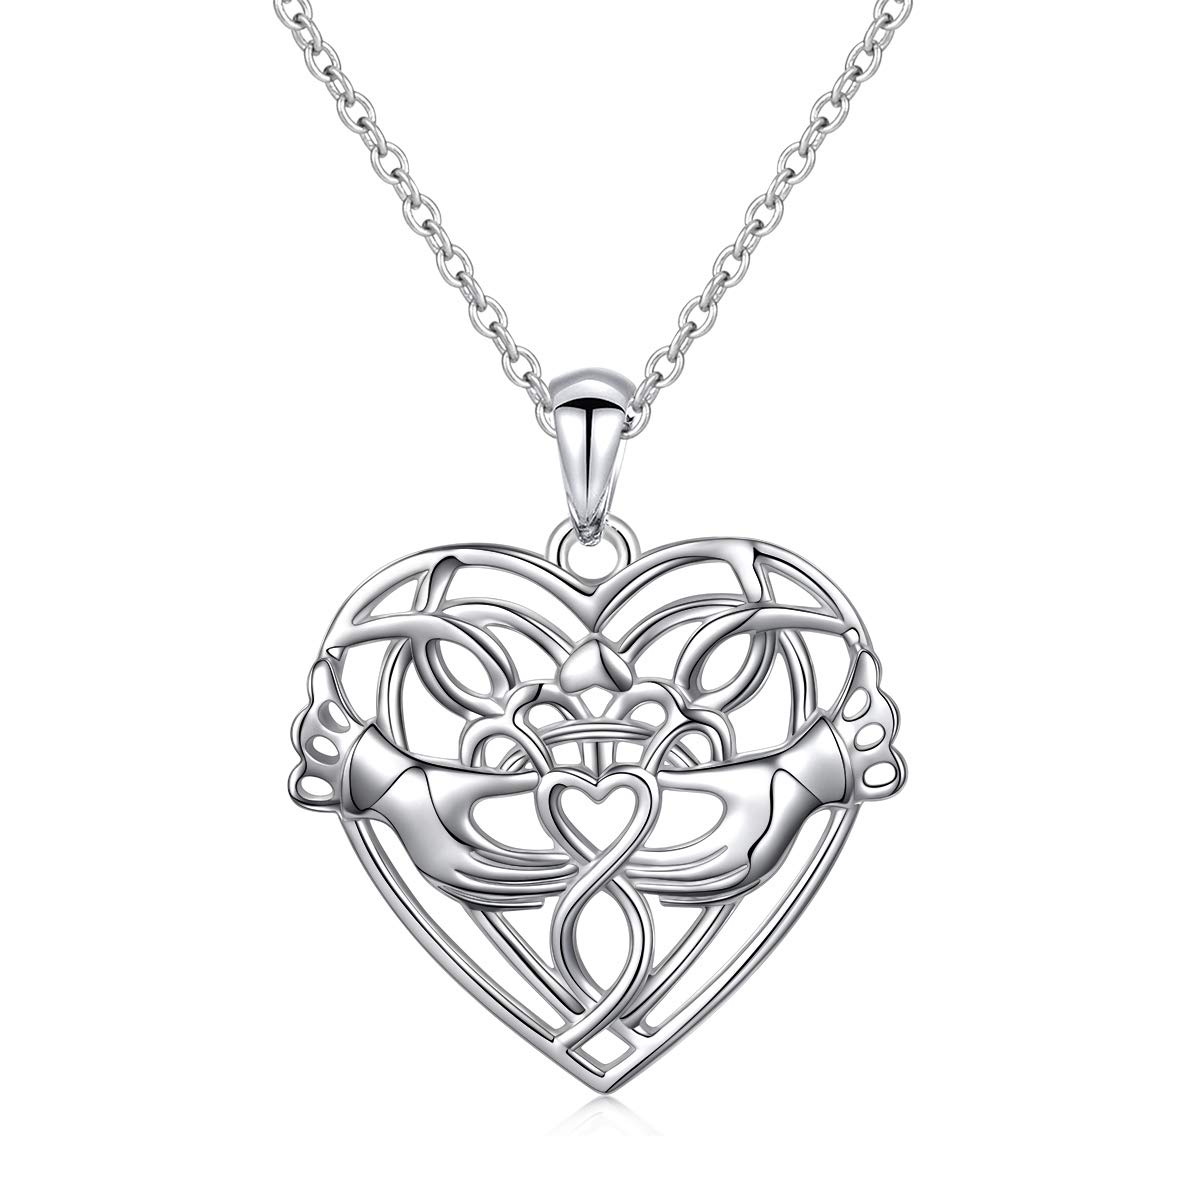 Sterling Silver Irish Celtic Knot Claddagh Lover Heart Shaped Pendant Necklace Bracelet 18 Harmonyball Jewelry US_B01FAMW9PQ